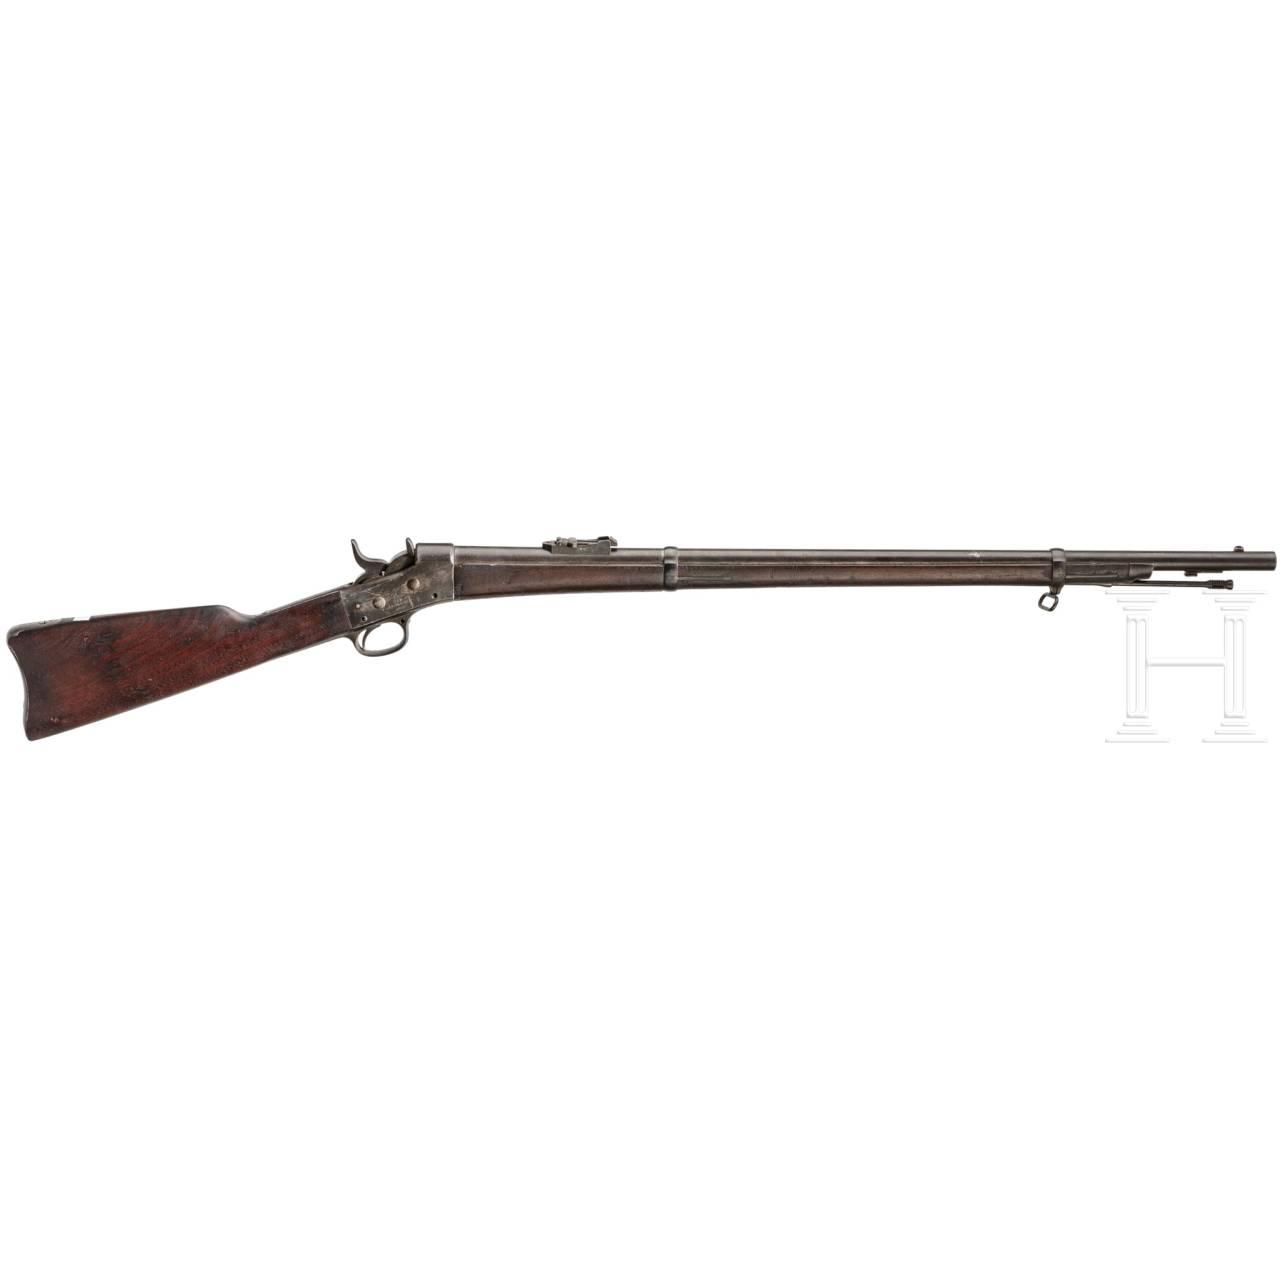 Springfield Rolling Block M 1870 U.S. Navy Rifle